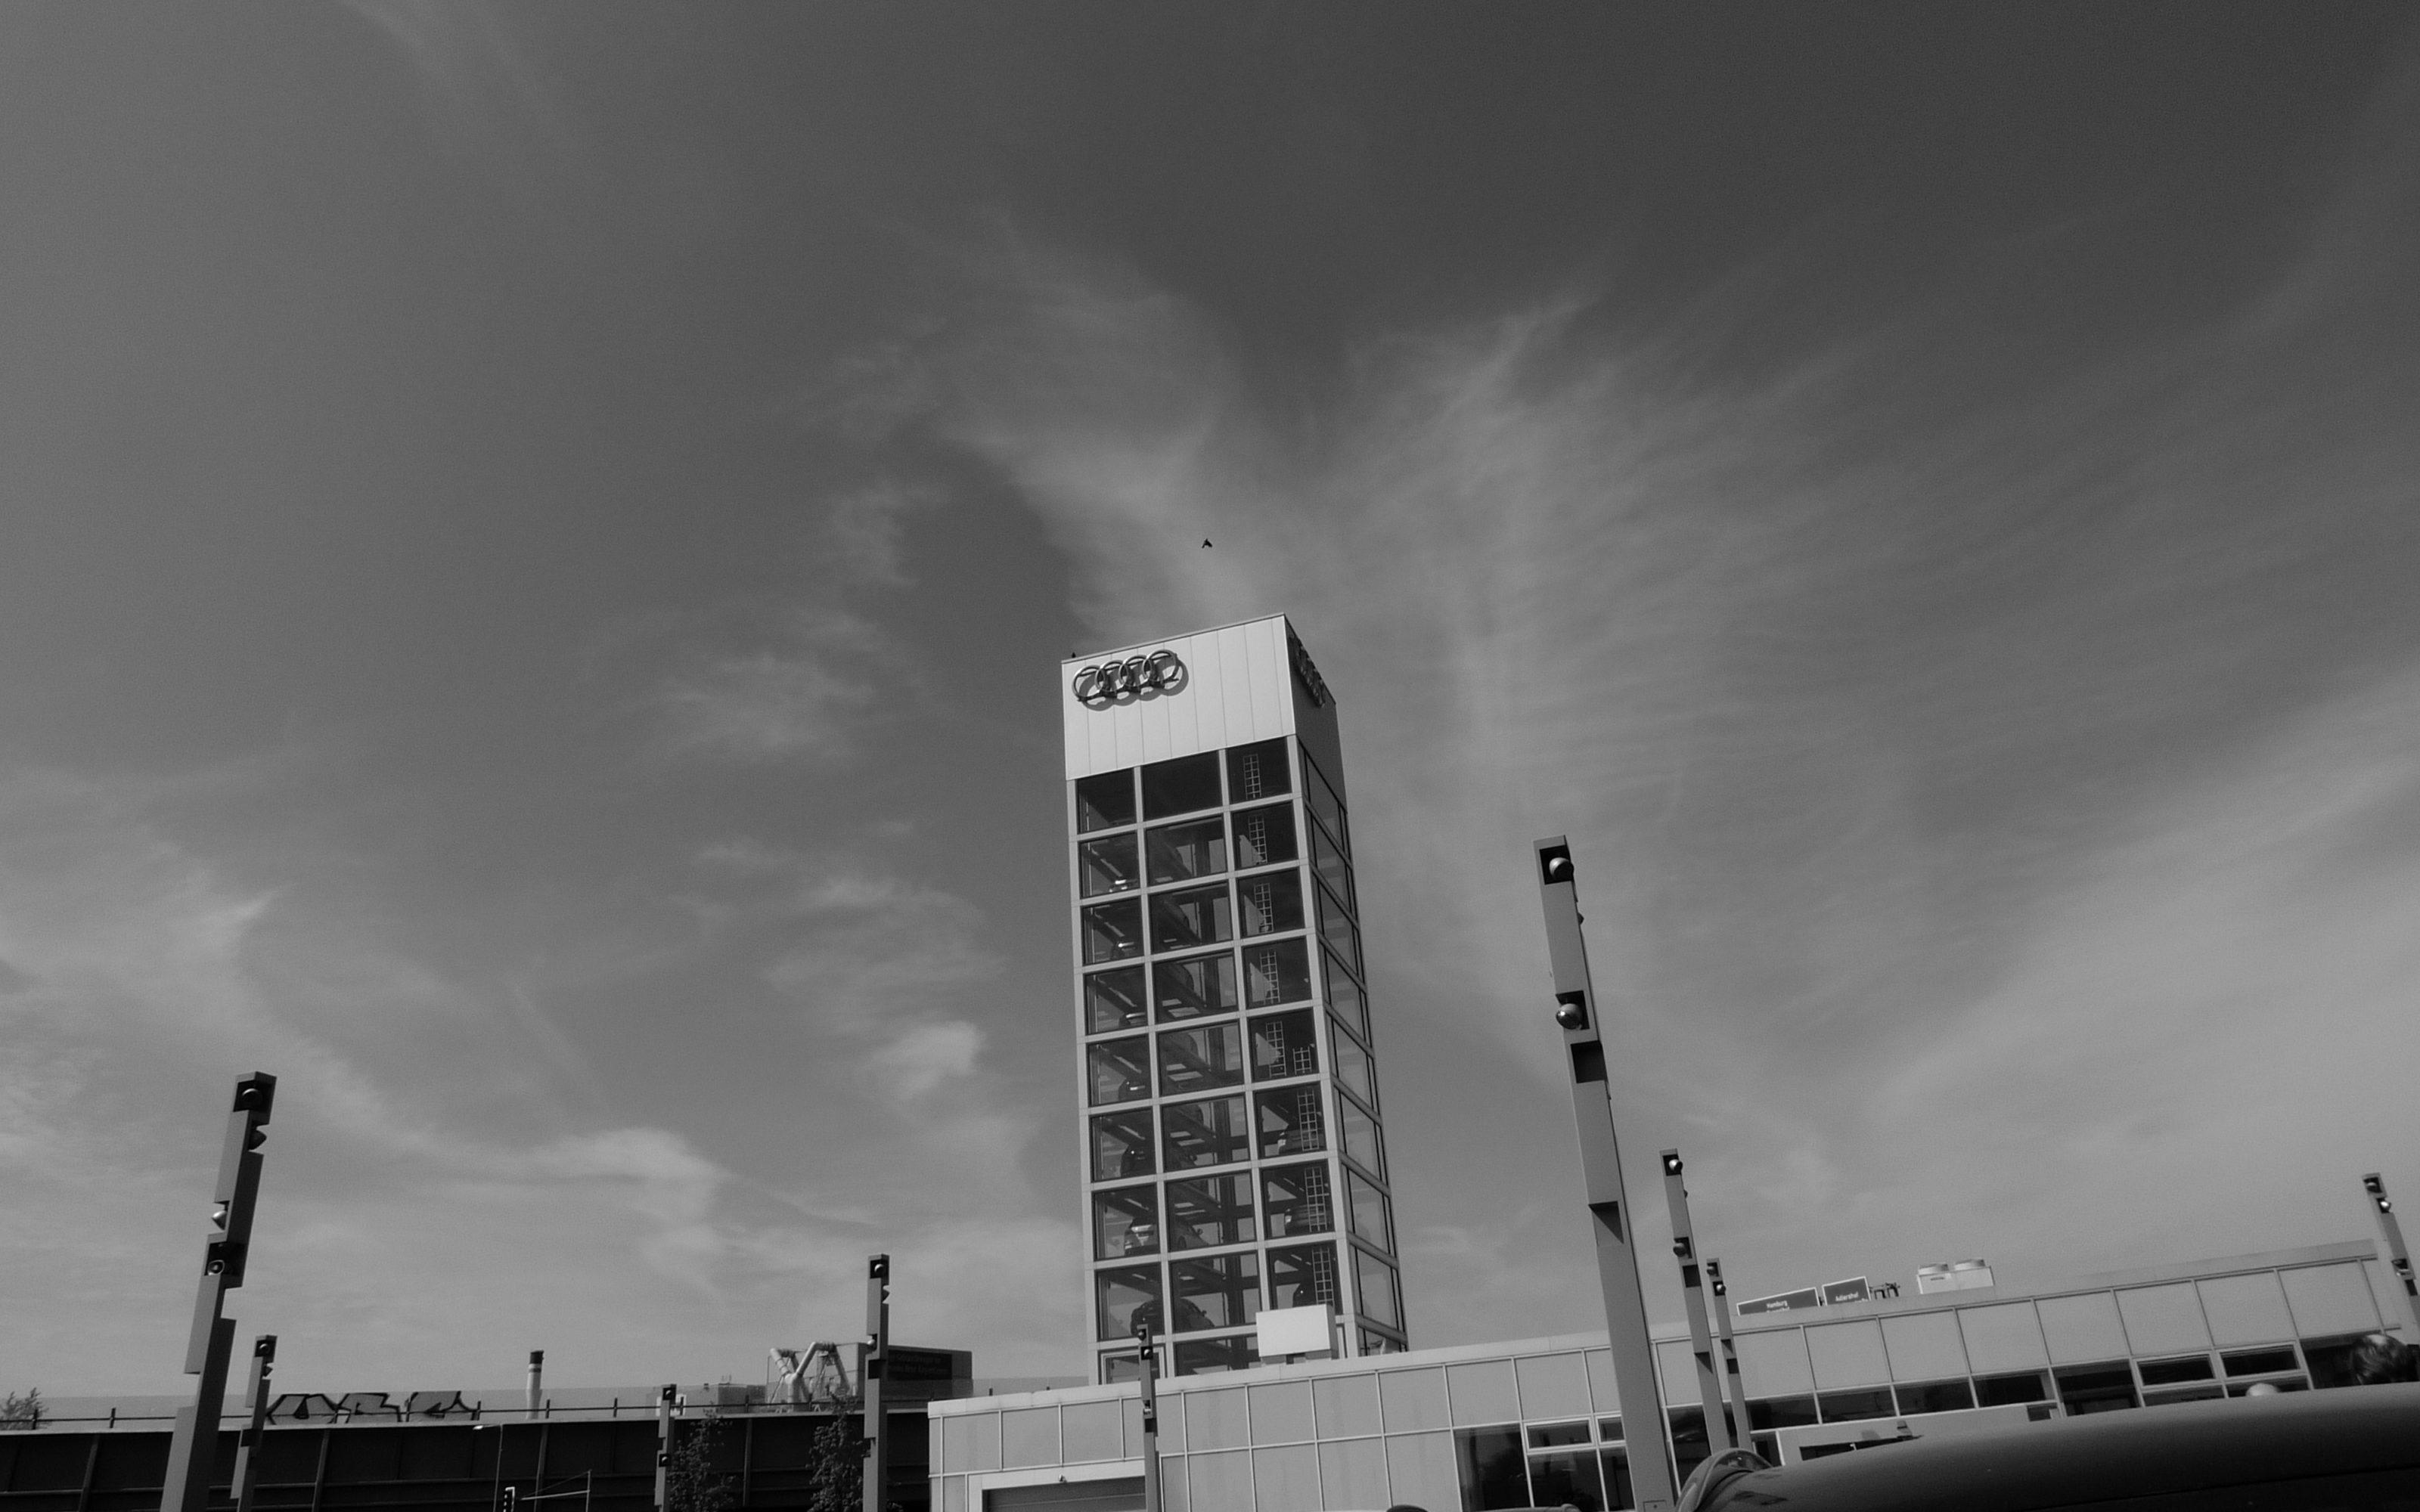 GRACO-Audi-Unternehmenskommunikation-Text-Redaktion